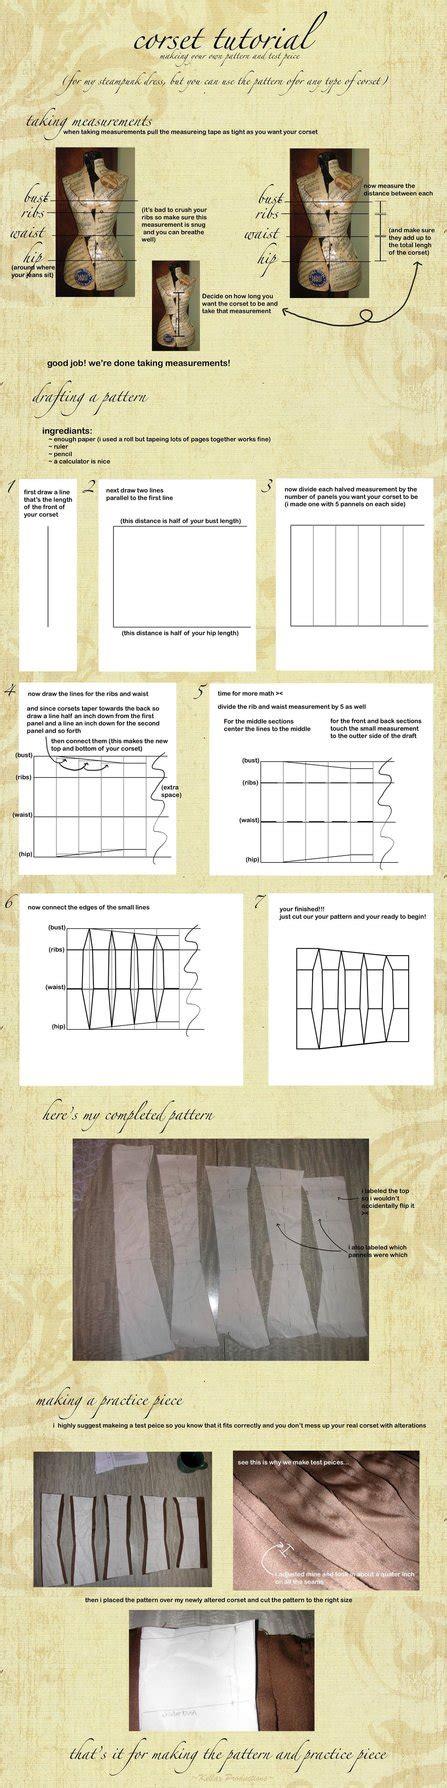 pattern drafting tutorial corset pattern drafting tutorial by kellaxproductions on